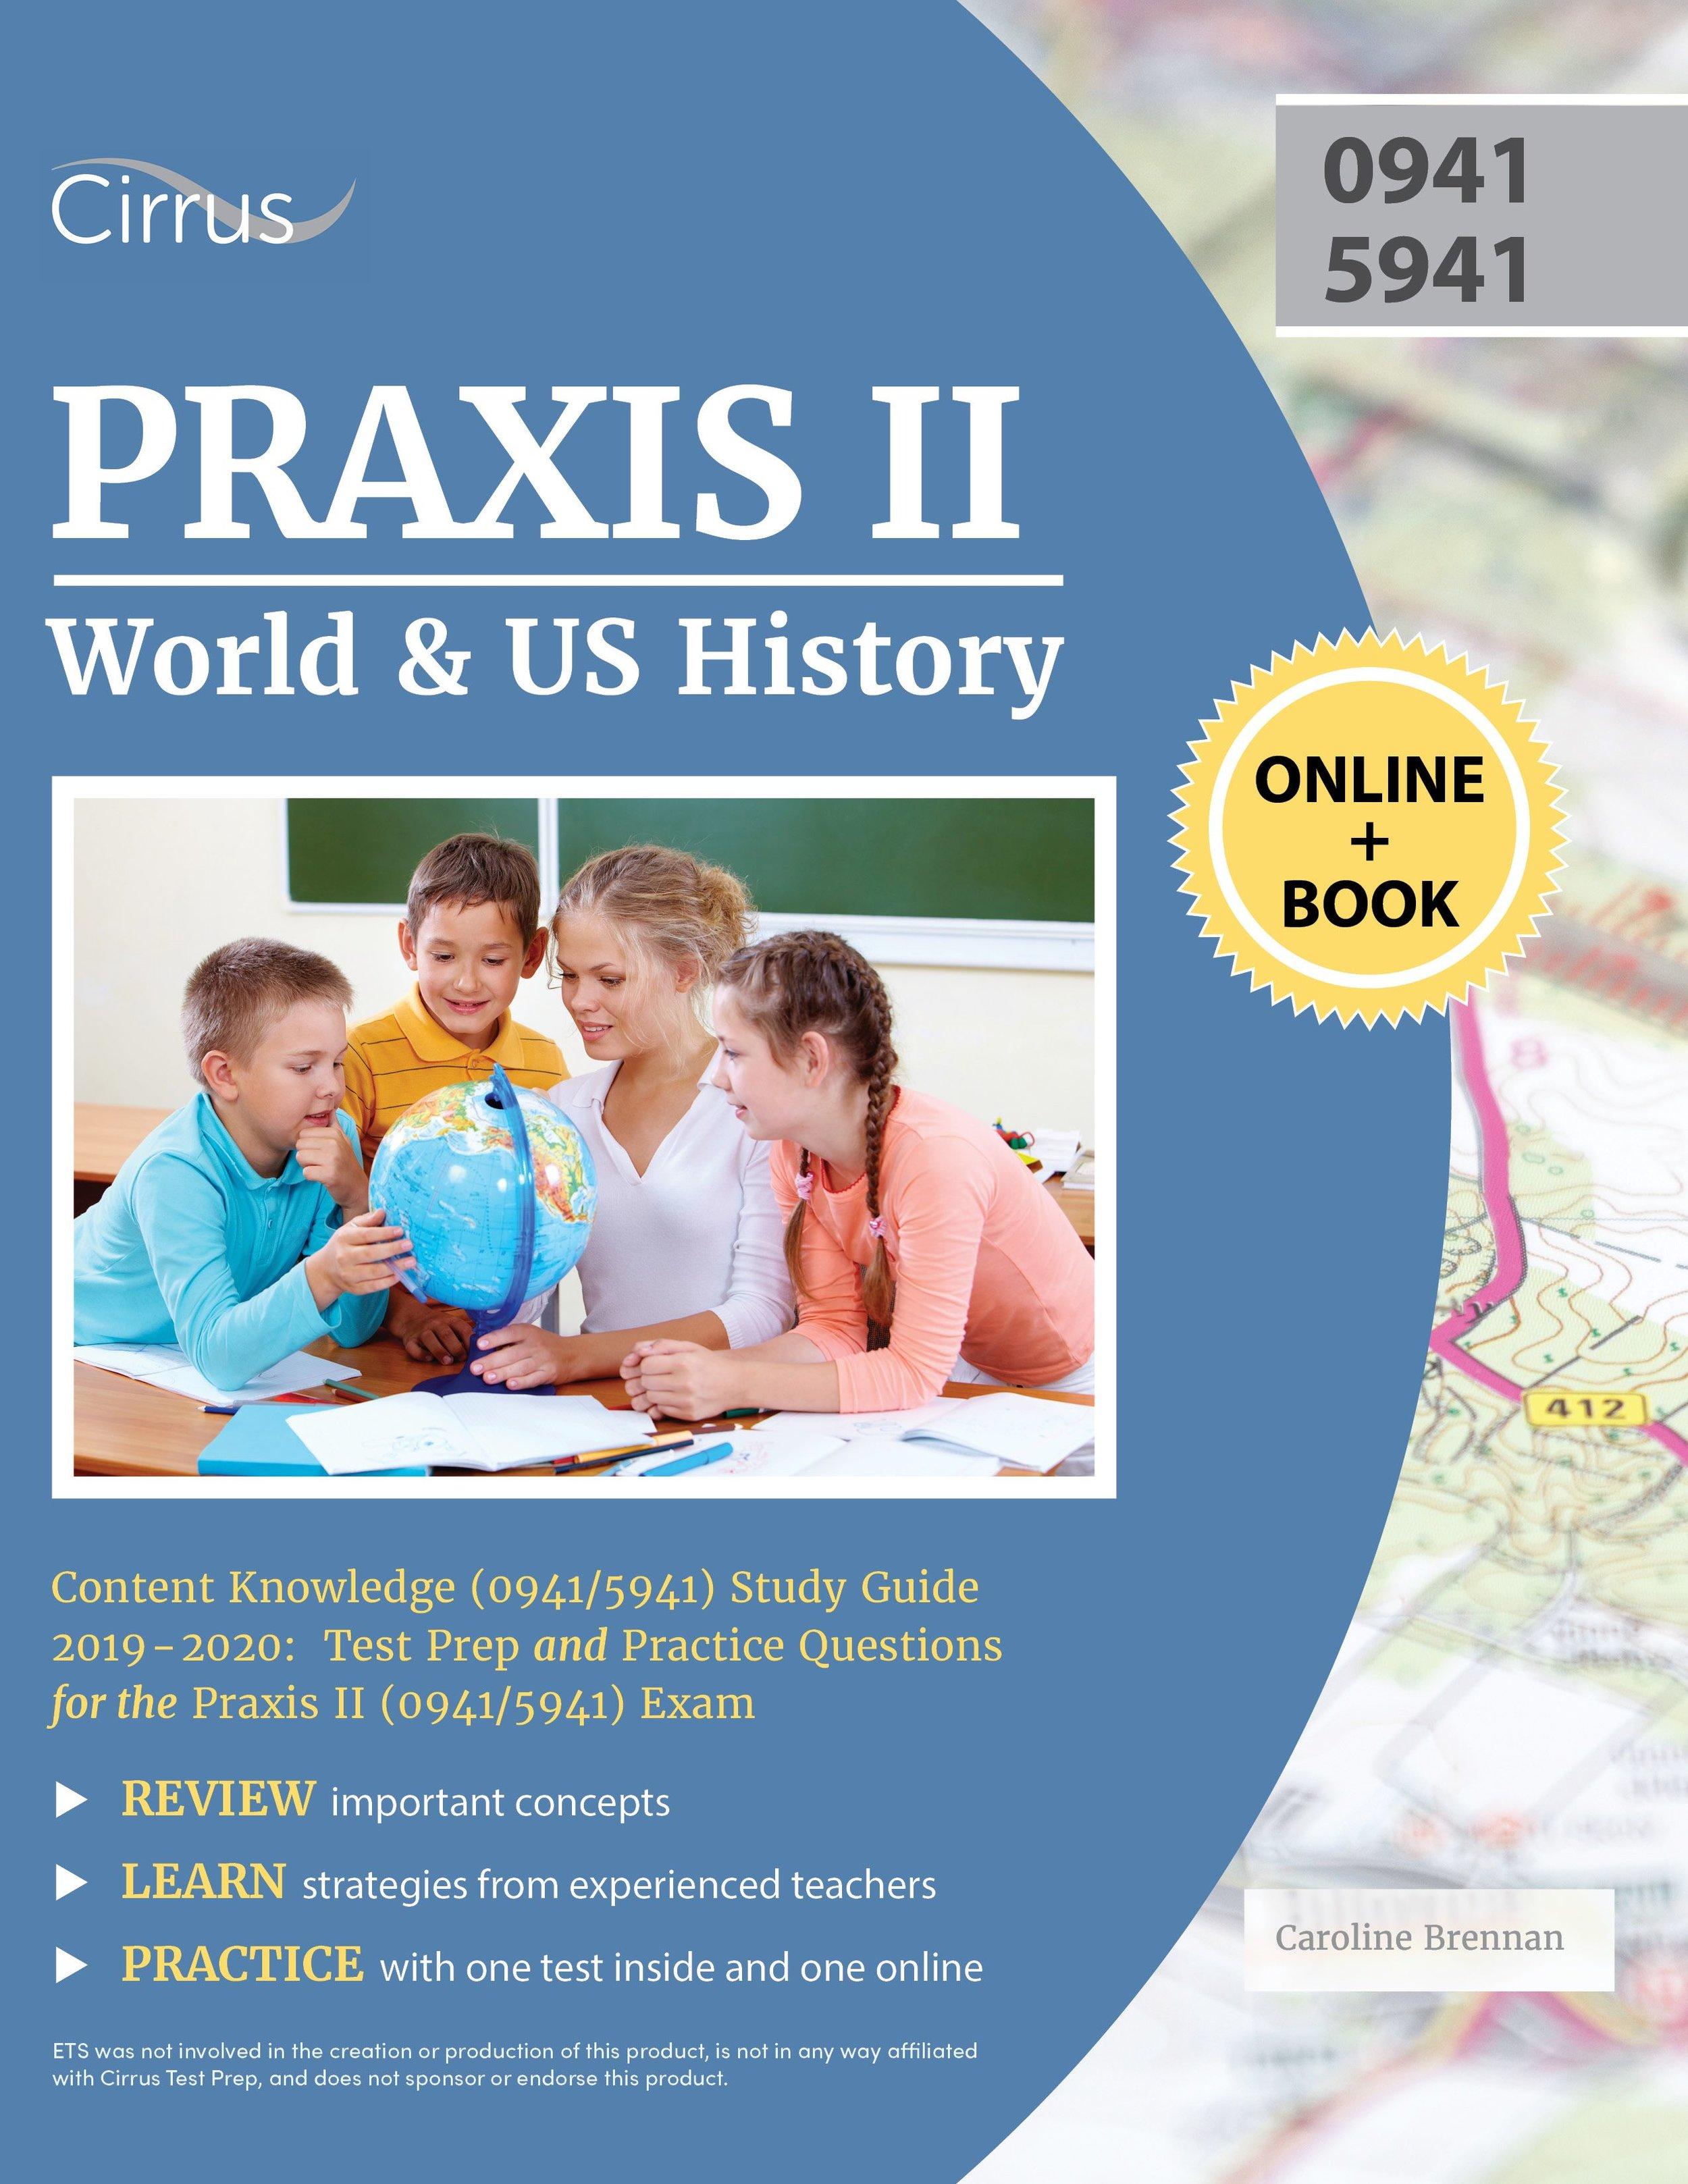 praxis_history_cover_website-compressor.jpg